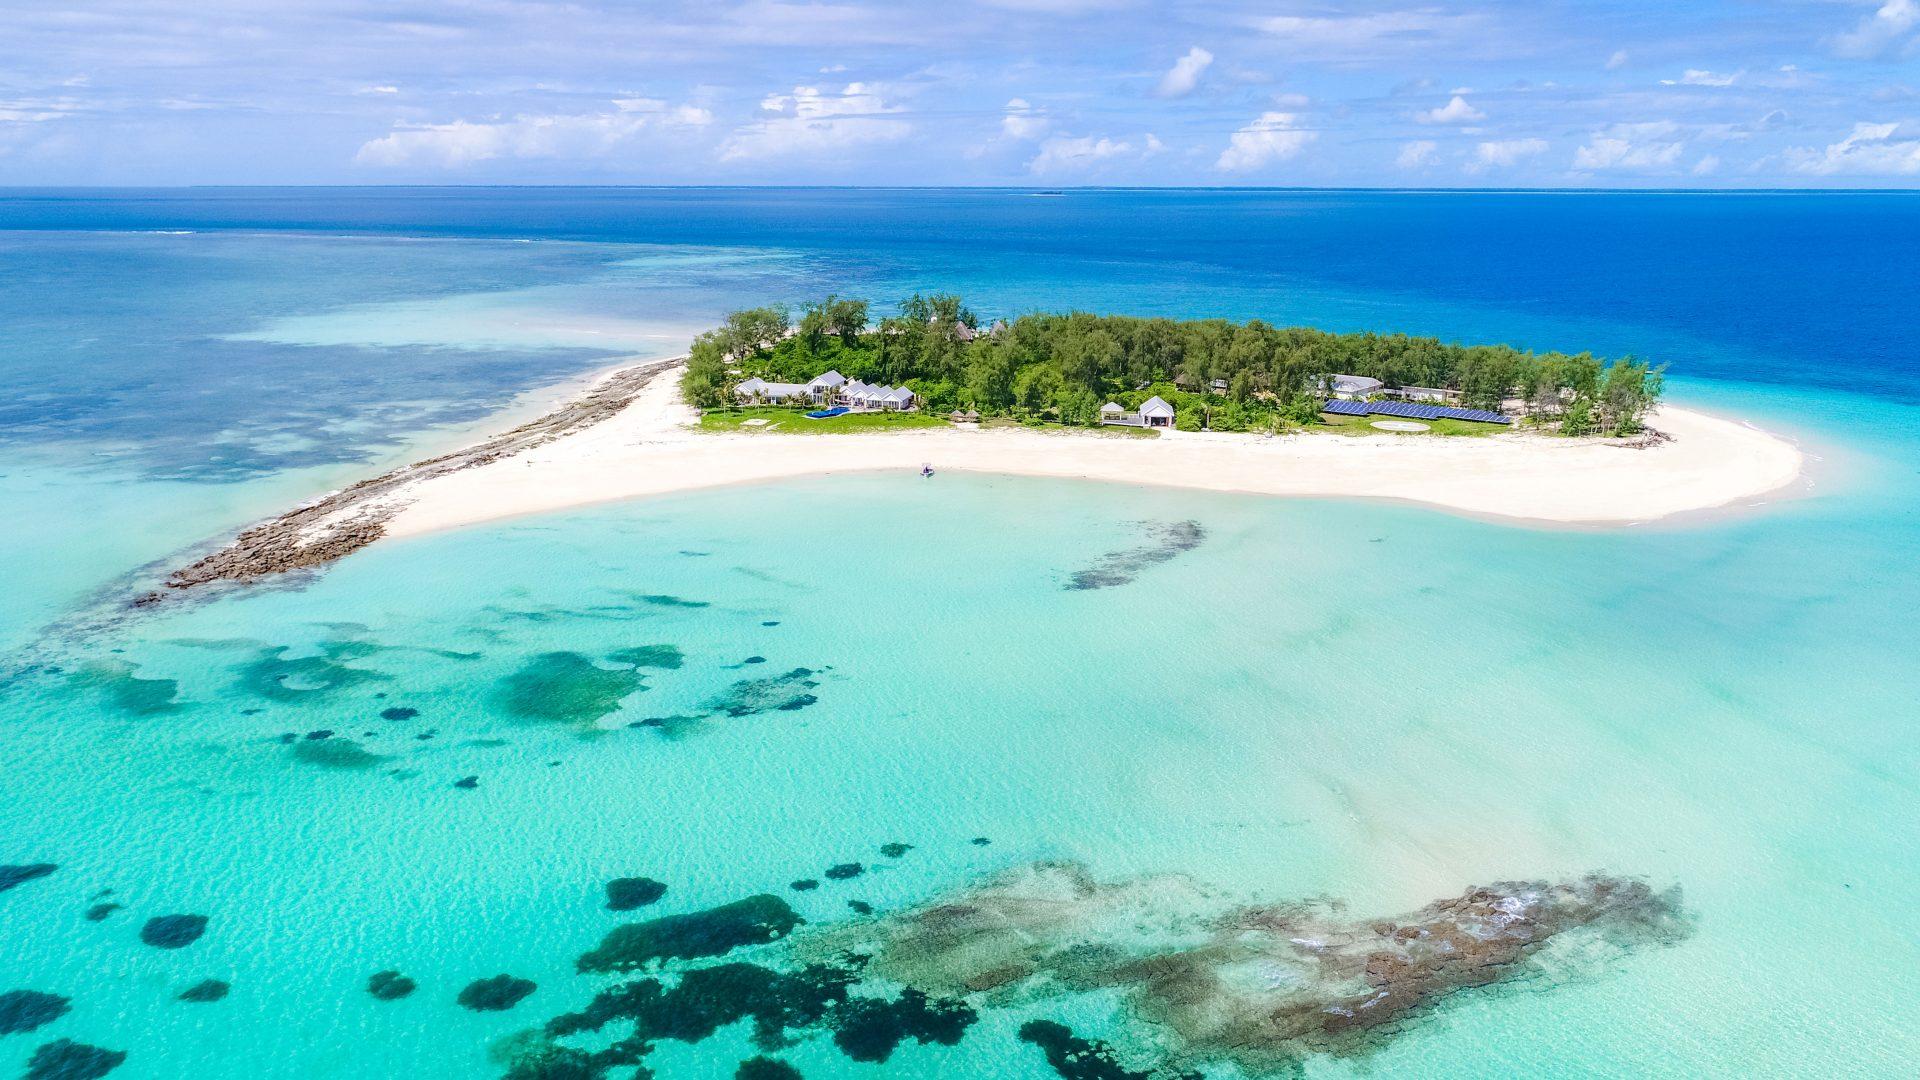 Agreement with Thanda Island